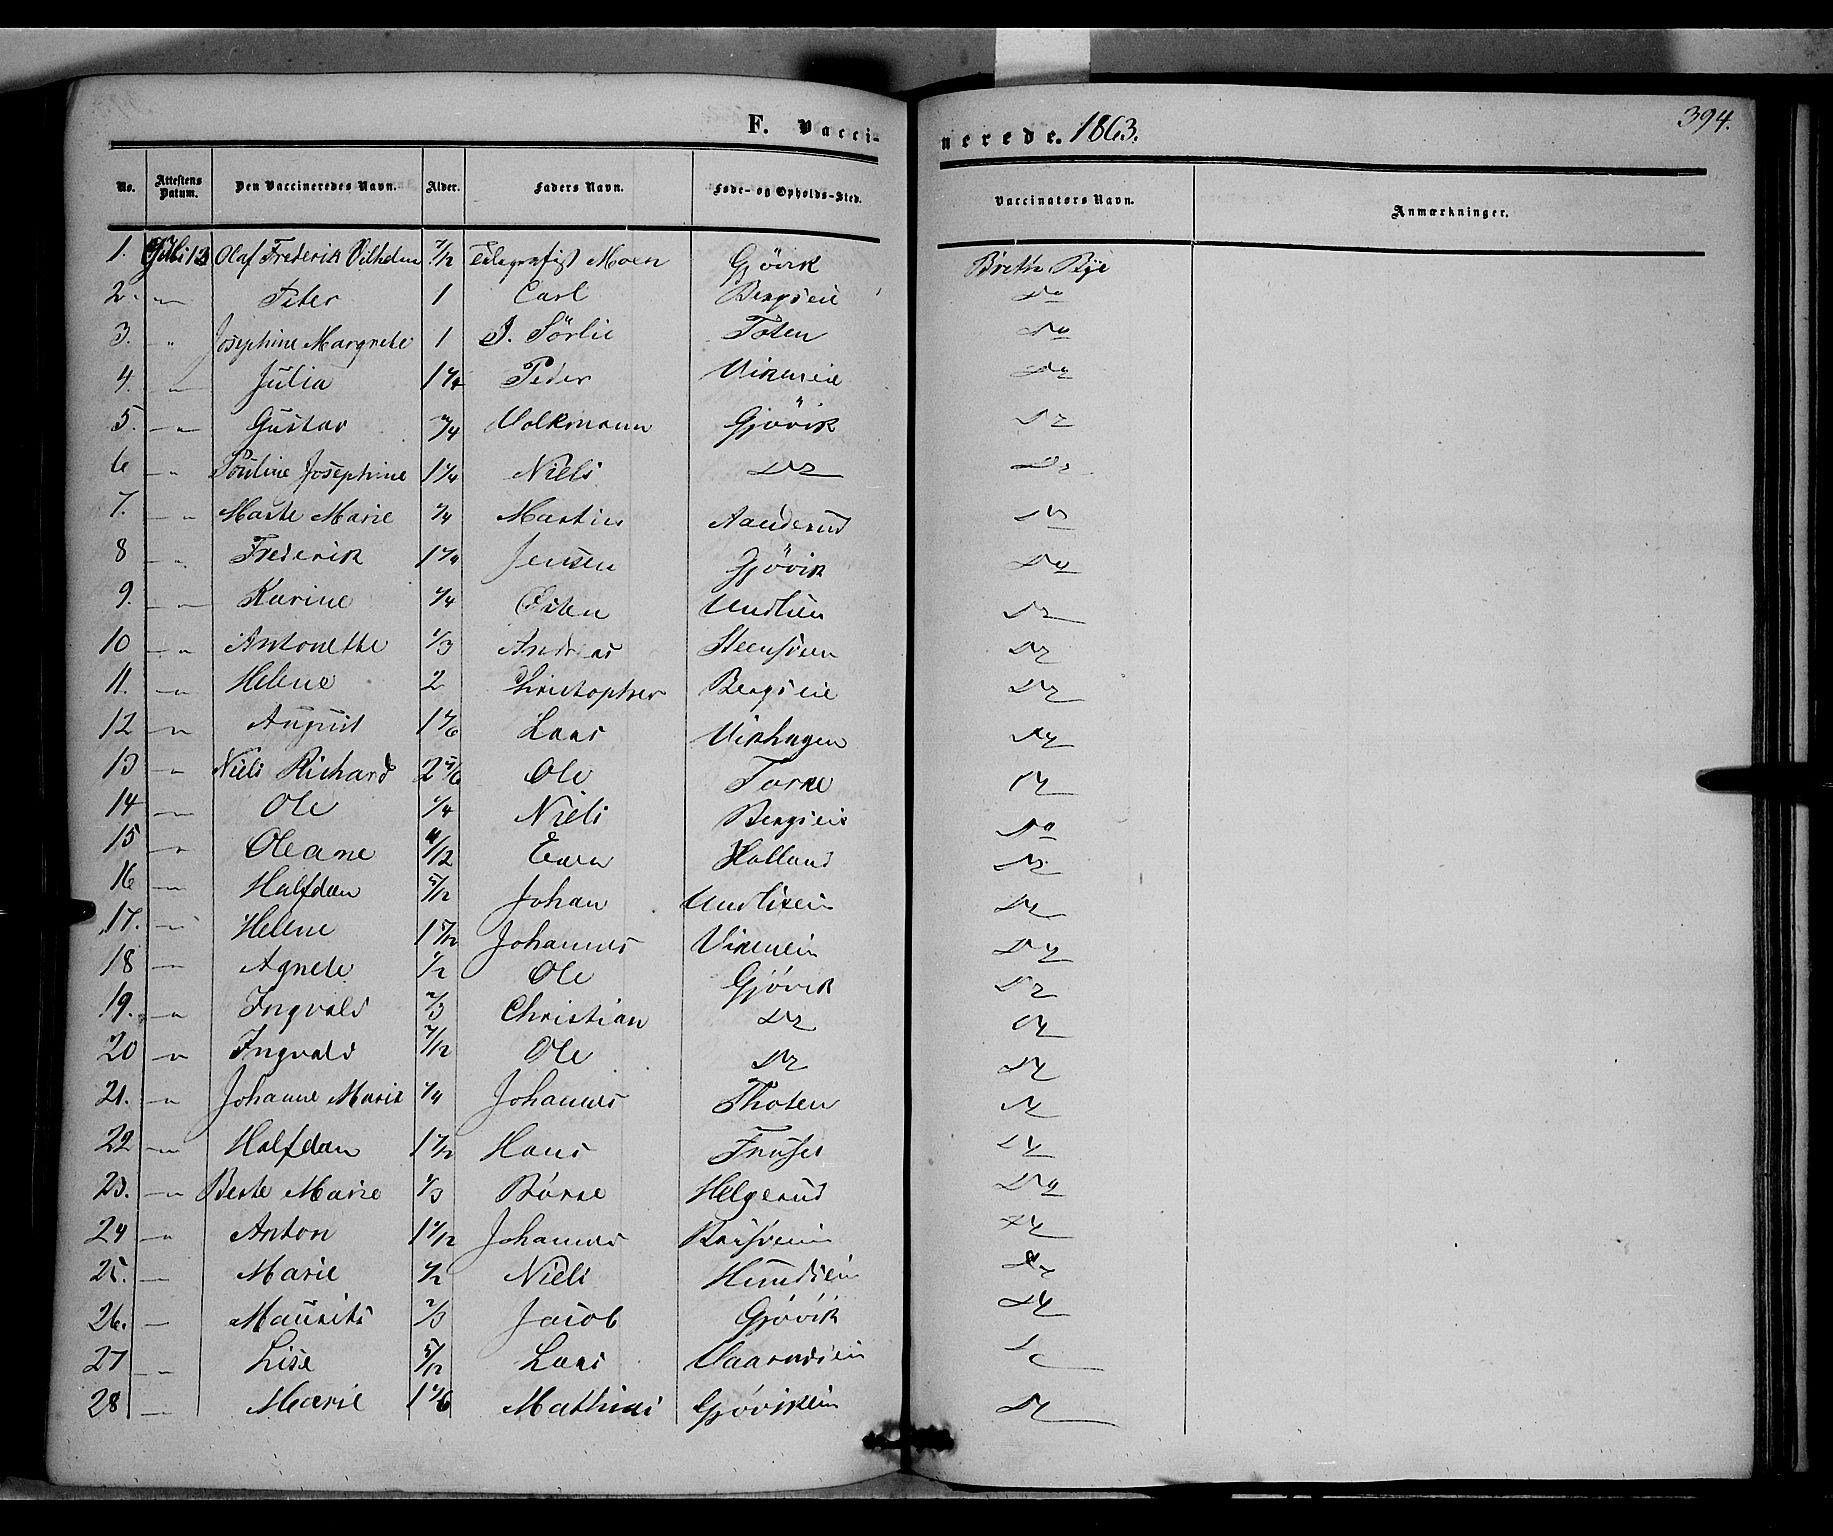 SAH, Vardal prestekontor, H/Ha/Haa/L0006: Ministerialbok nr. 6, 1854-1866, s. 394